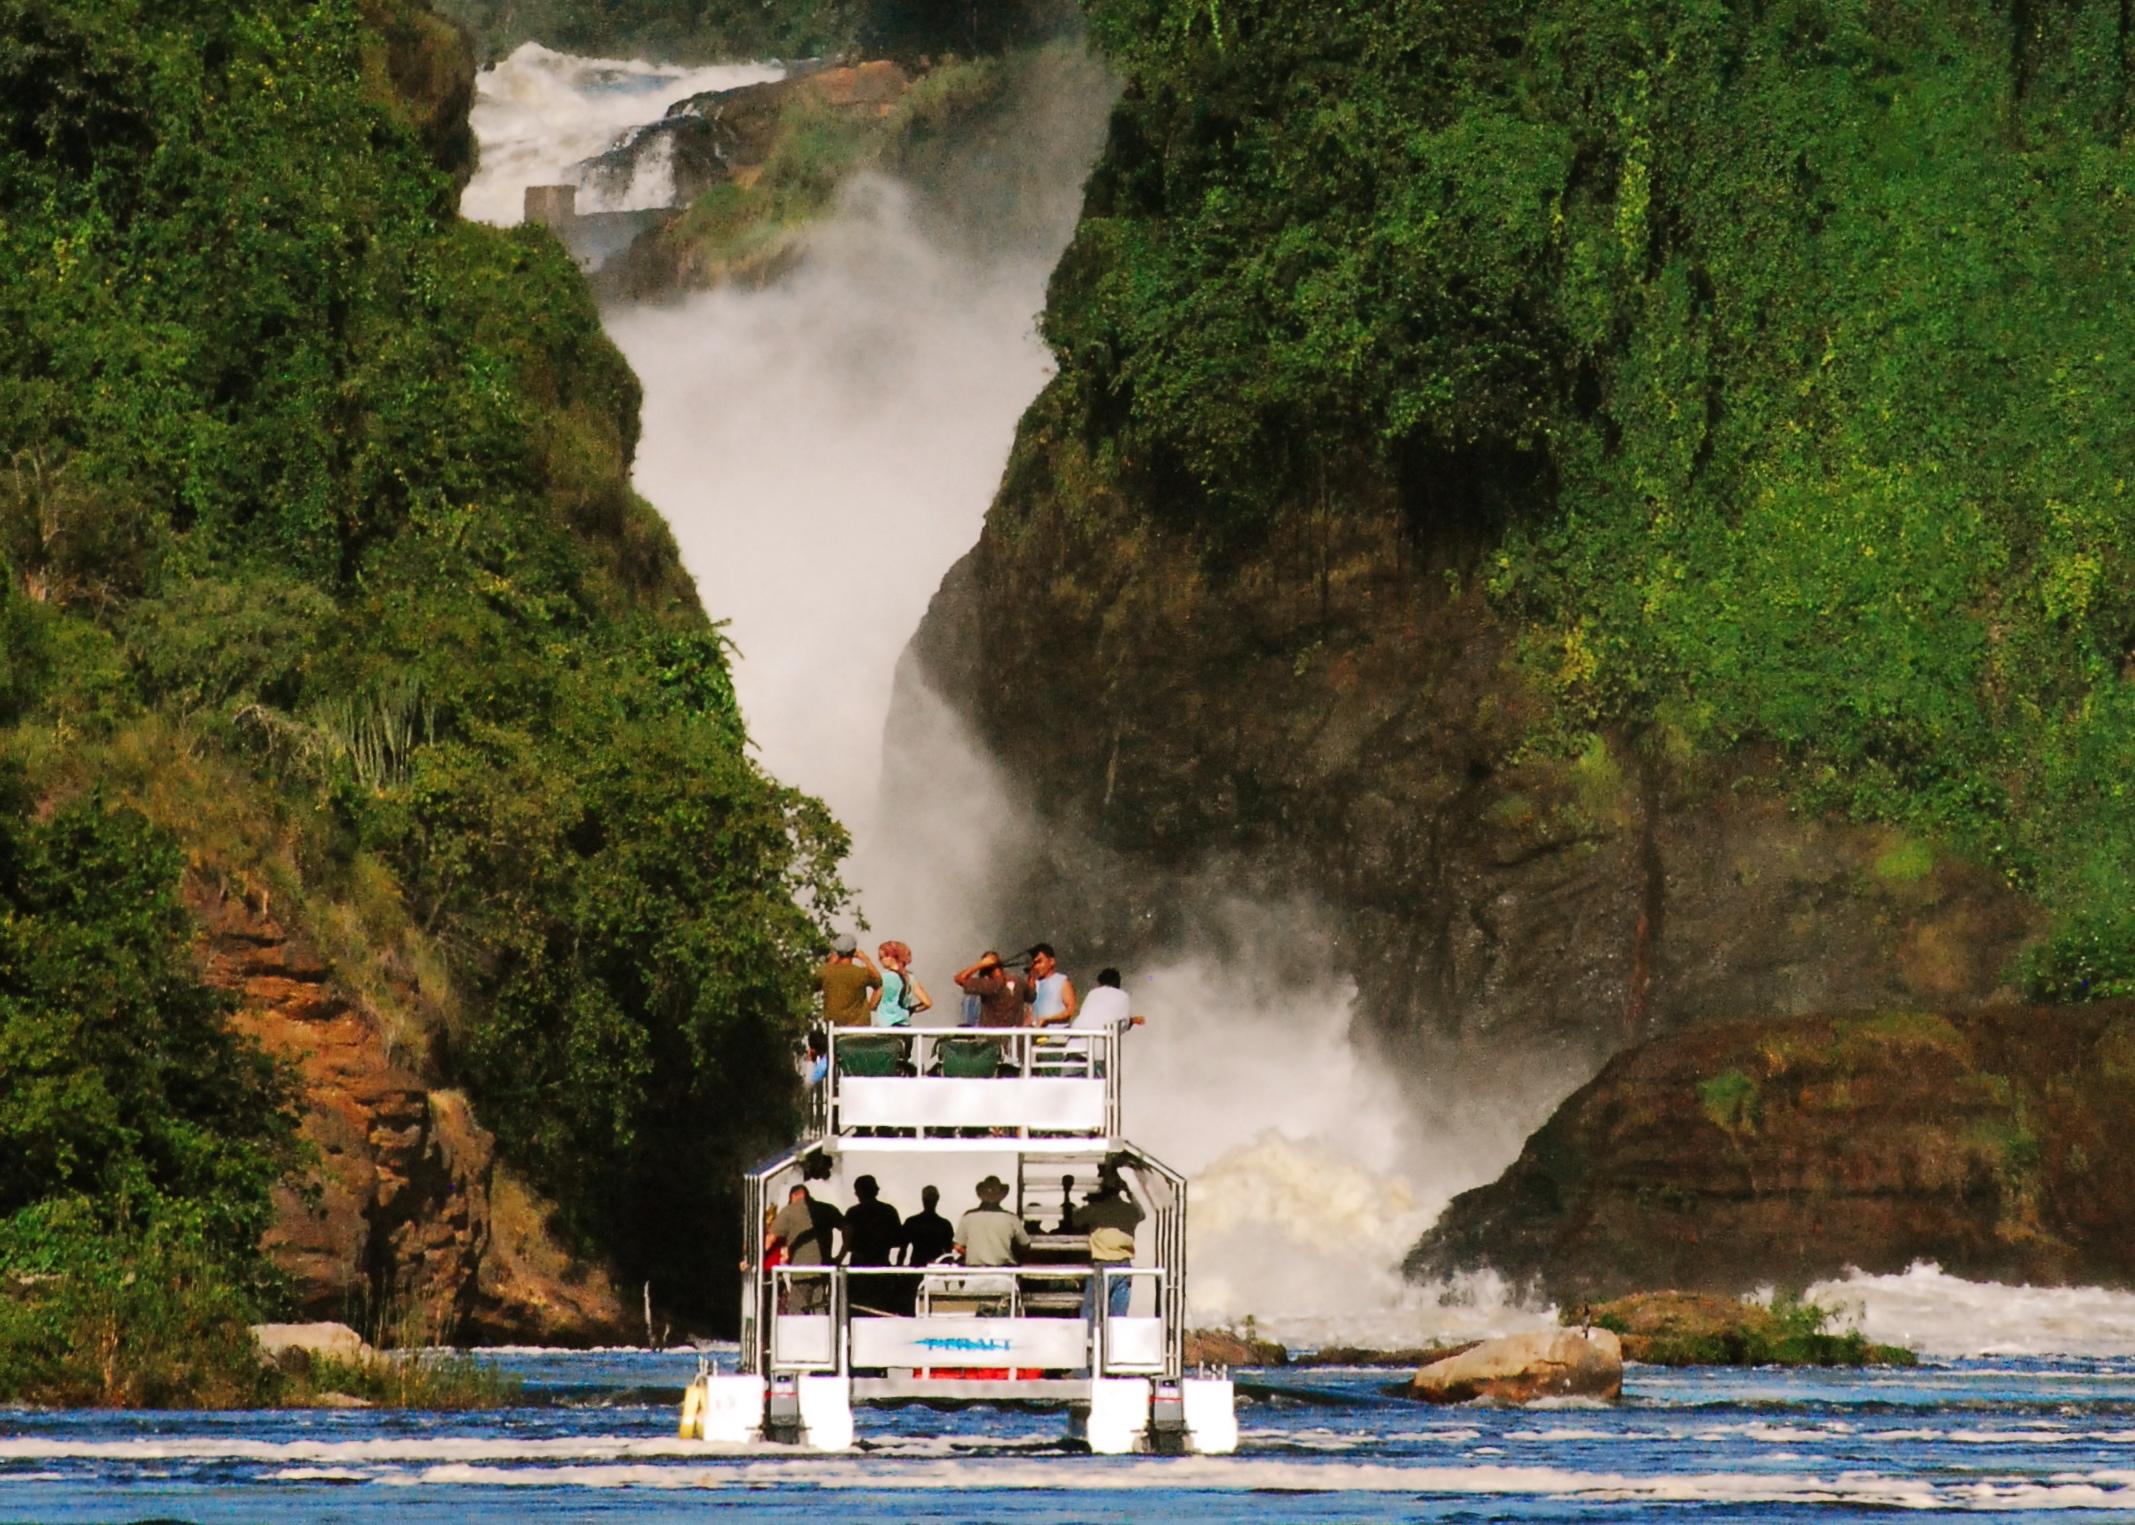 wp-content/uploads/itineraries/Uganda/murchison-falls.jpg